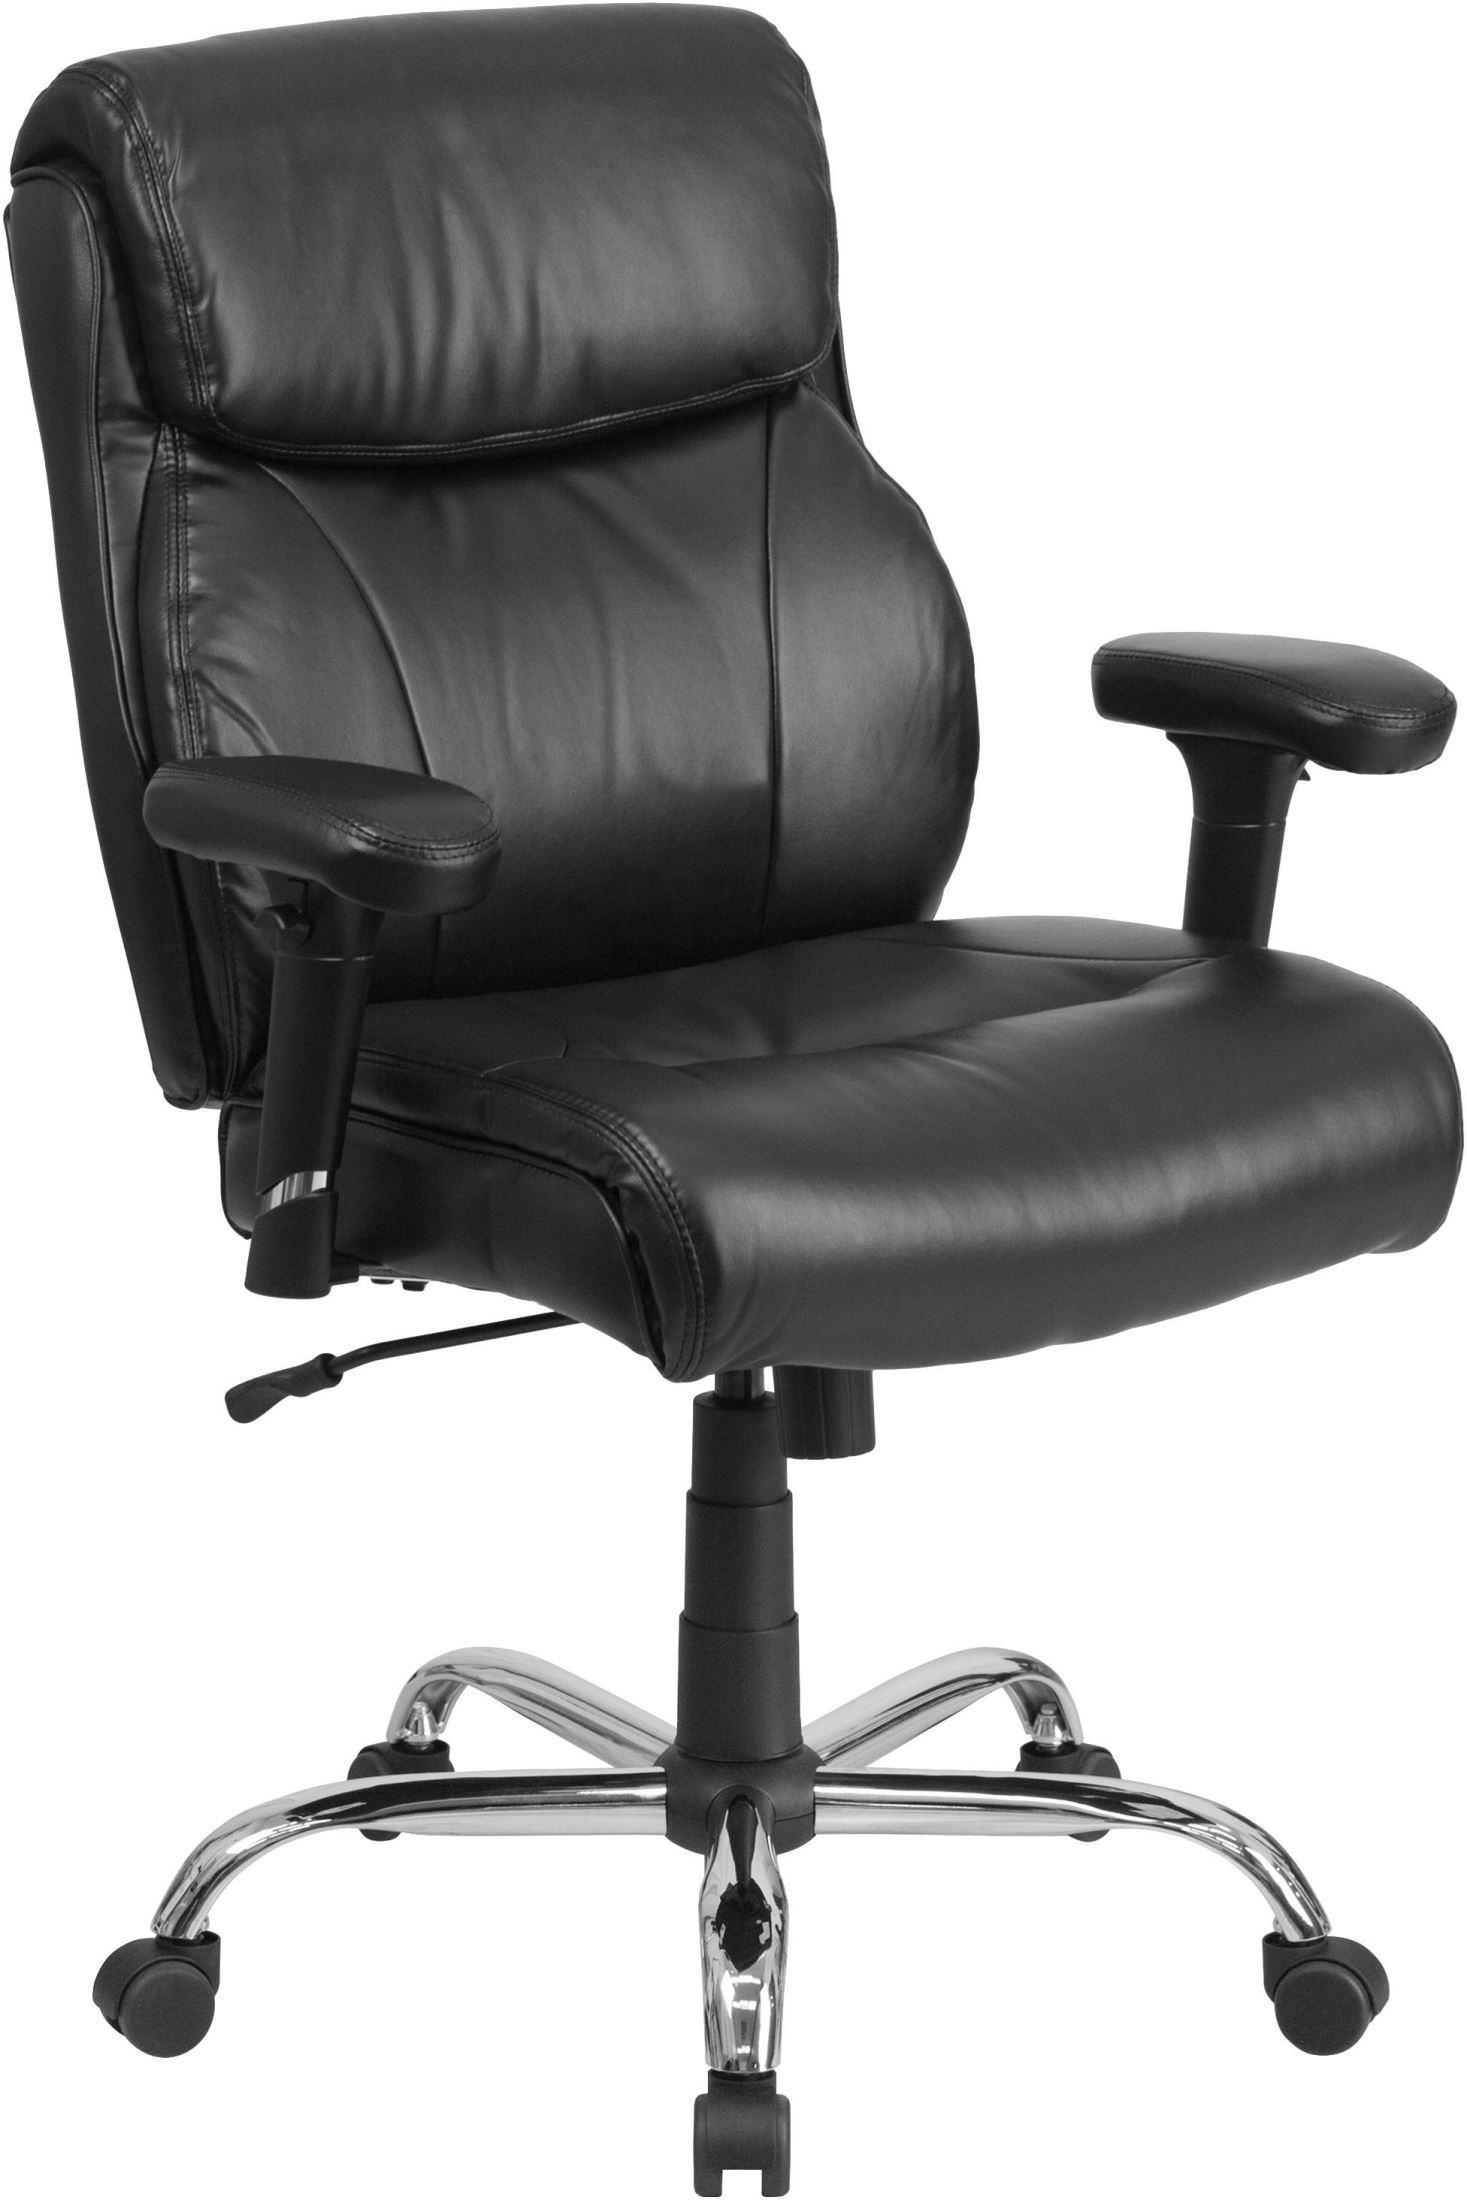 tall swivel chair folding ikea hercules big and black 22inch task from